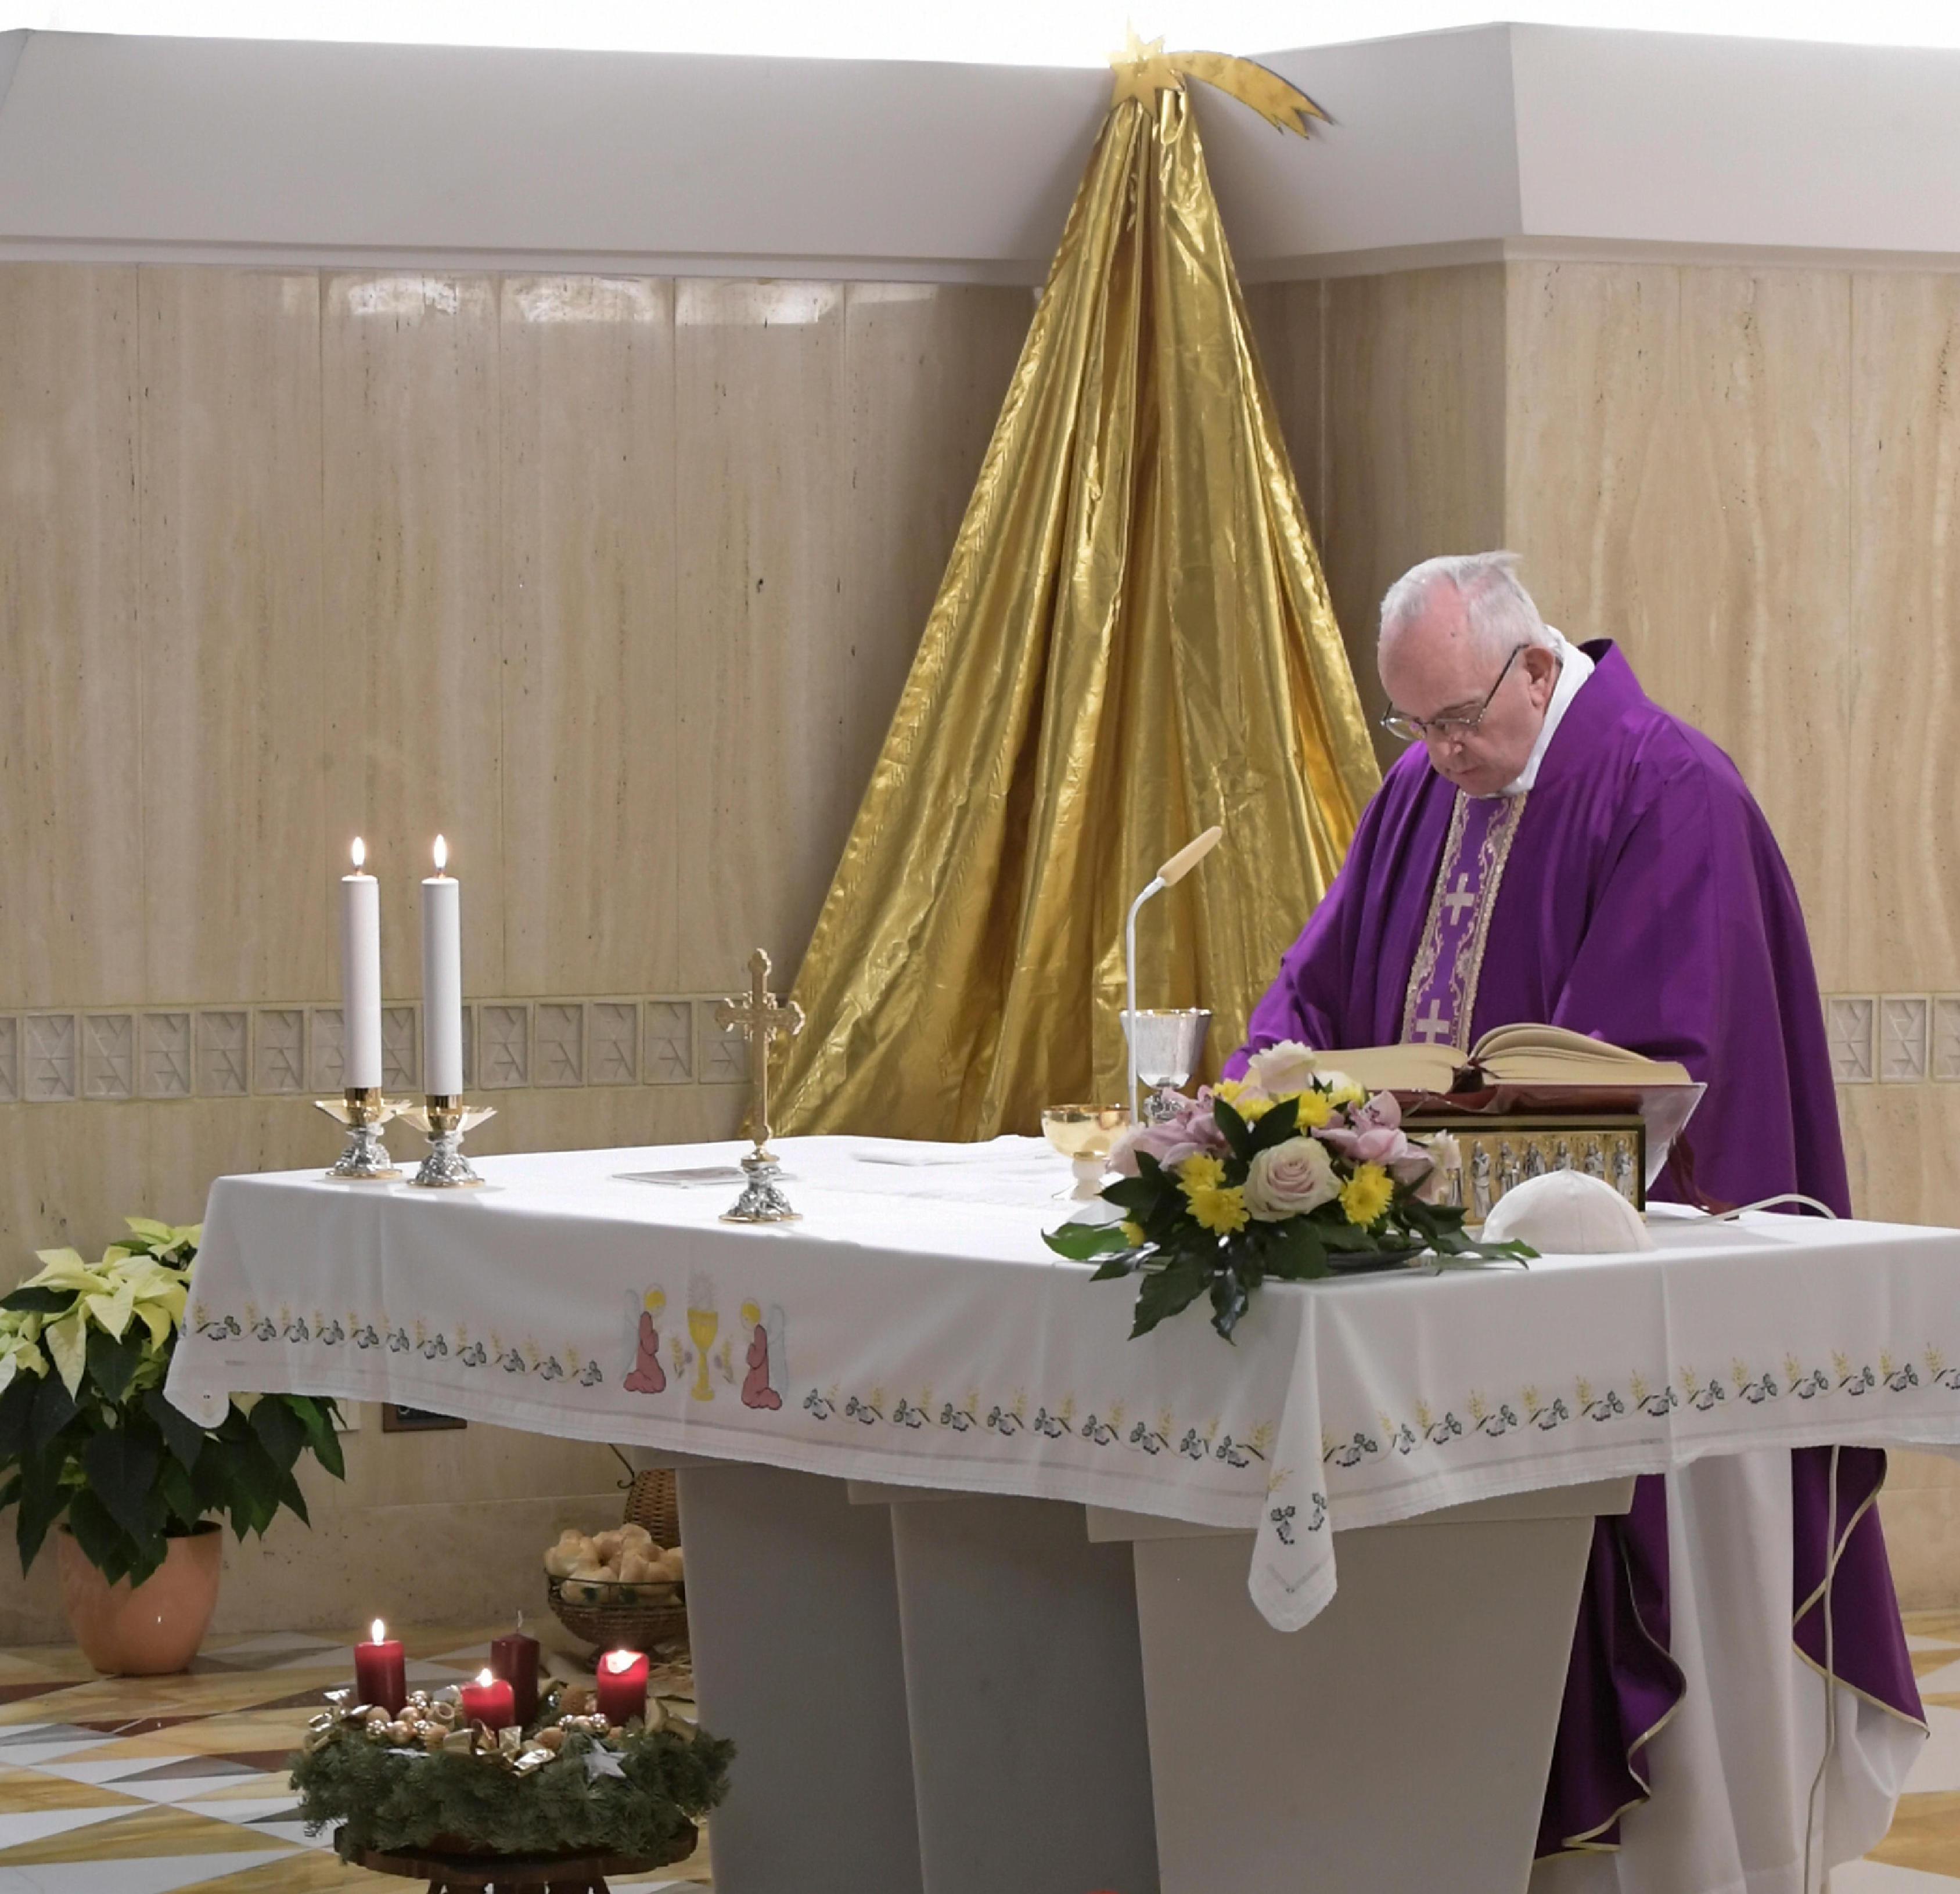 Misa en Santa Marta, 18 dic. 2018 © Vatican Media